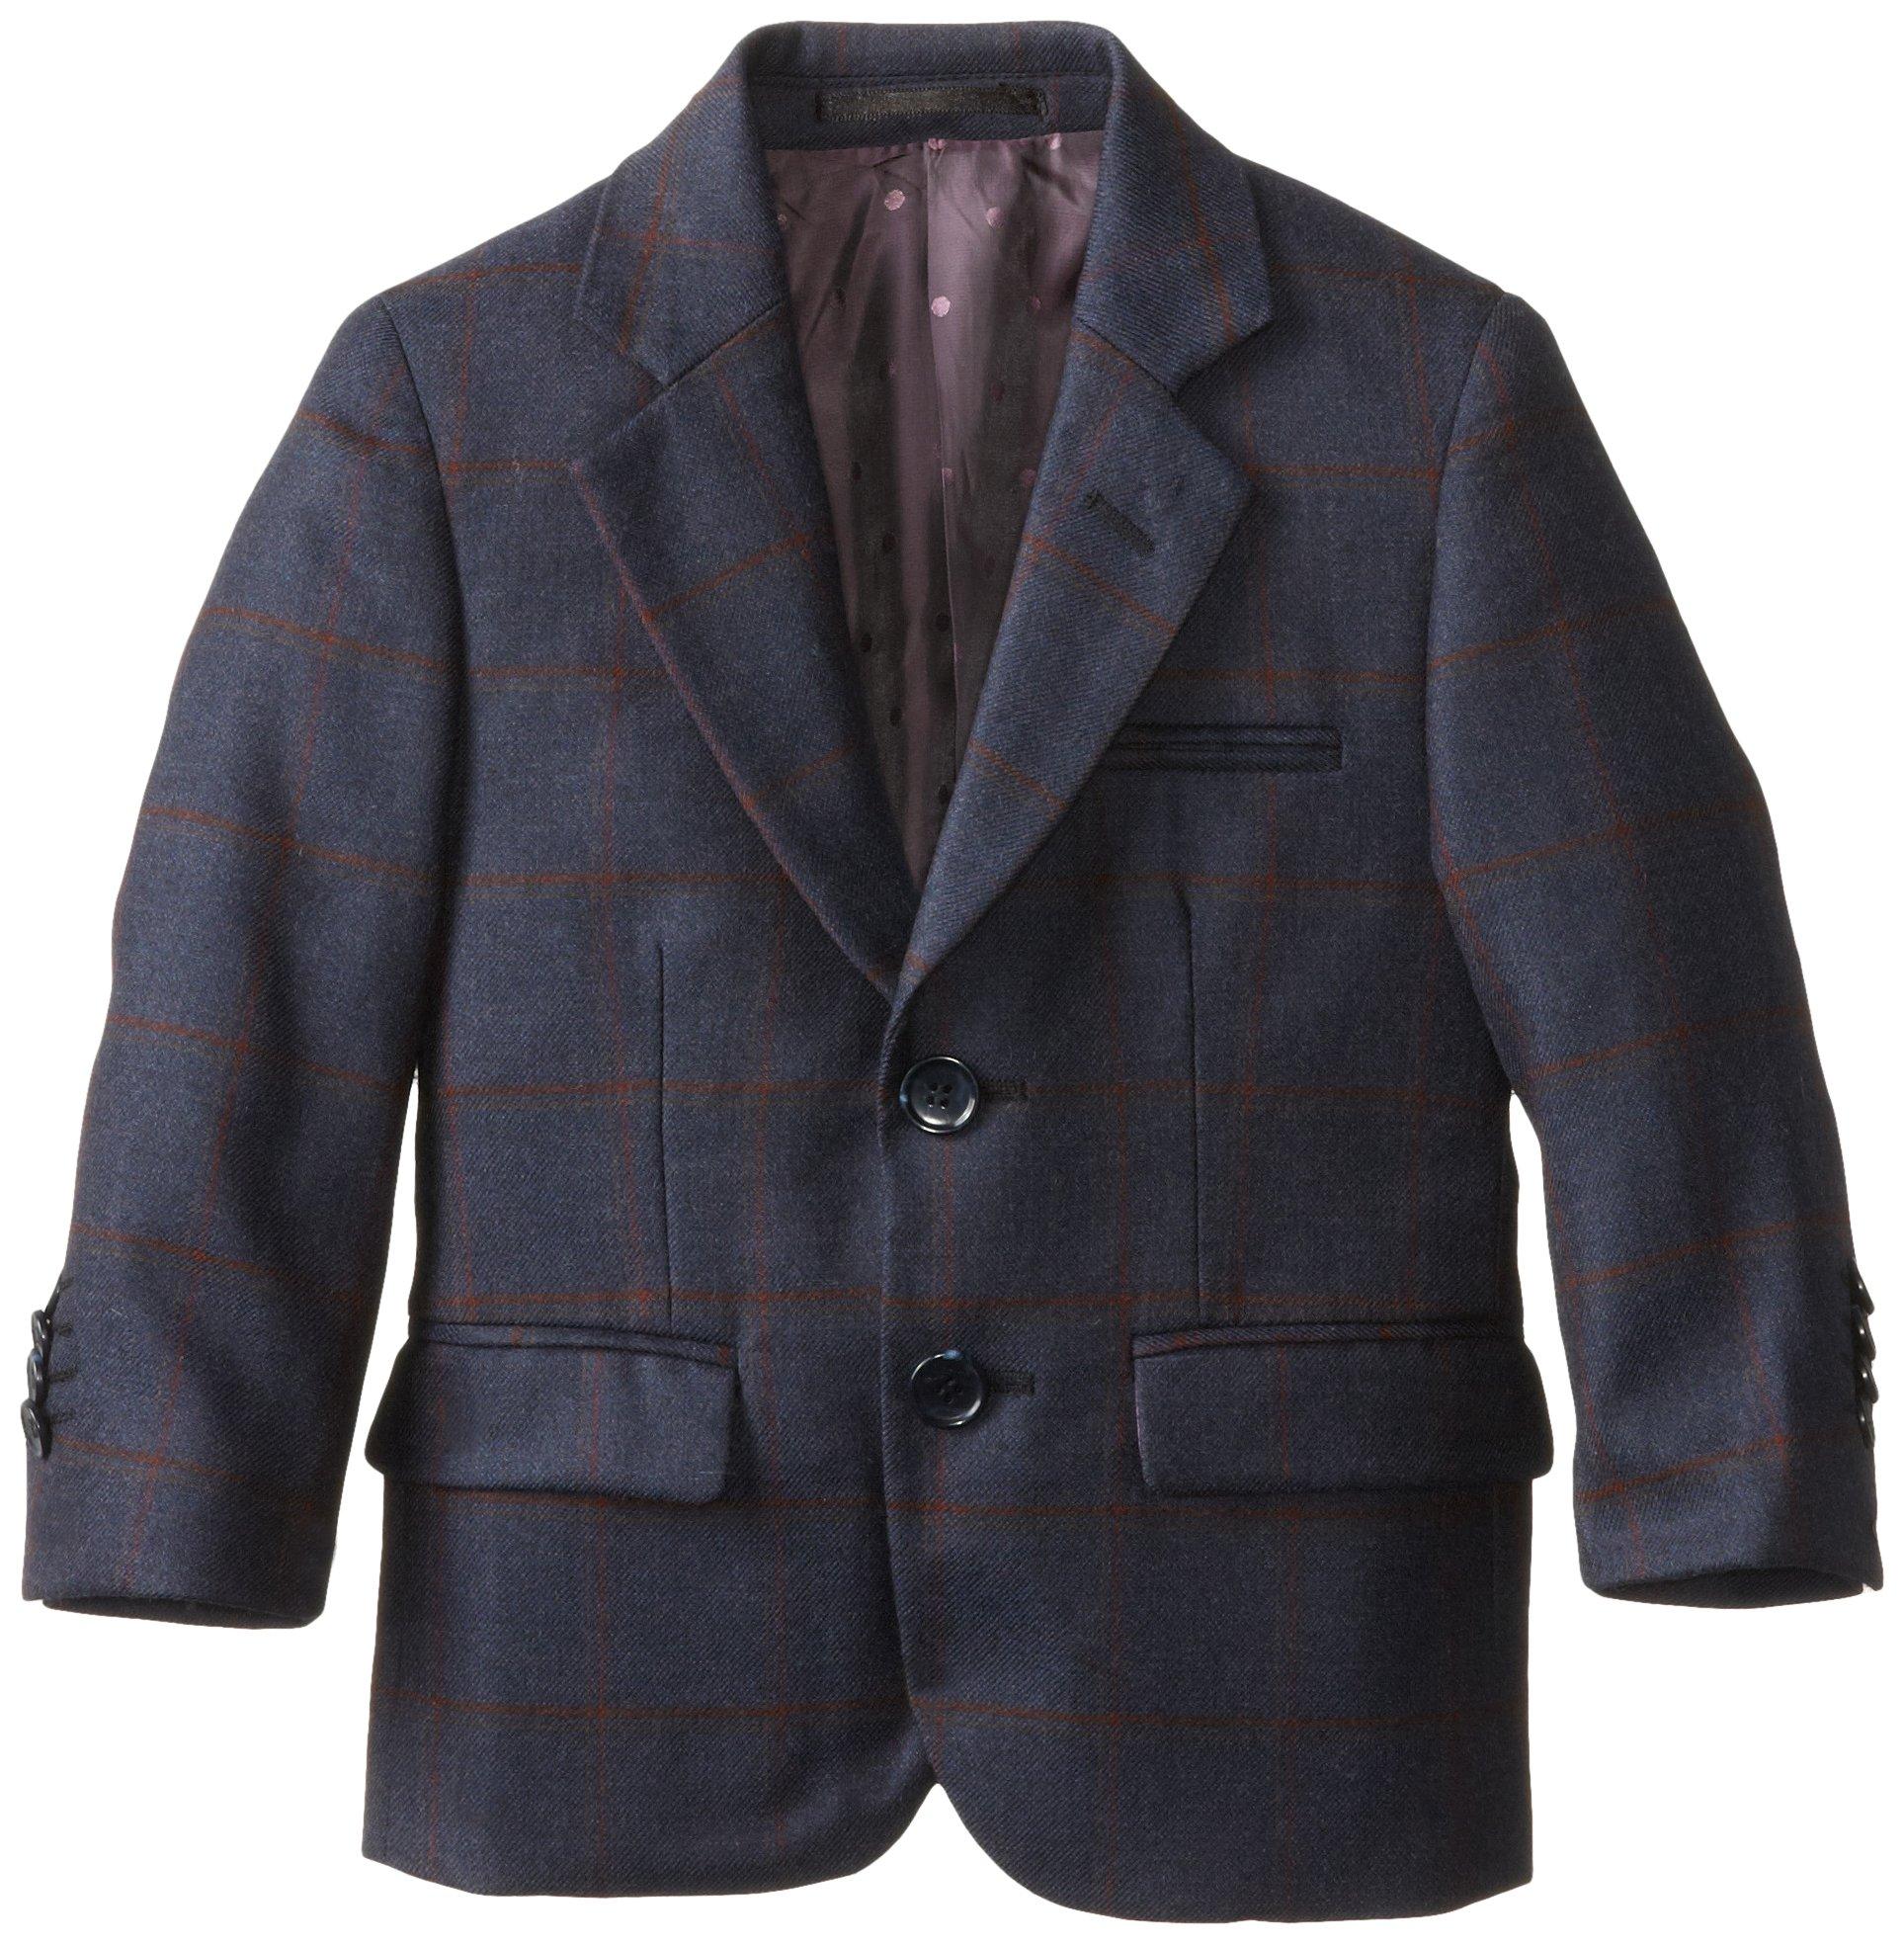 Isaac Mizrahi Black Label Little Boys' Little Pure Wool Plaid Blazer, Blue, 7 by Isaac Mizrahi